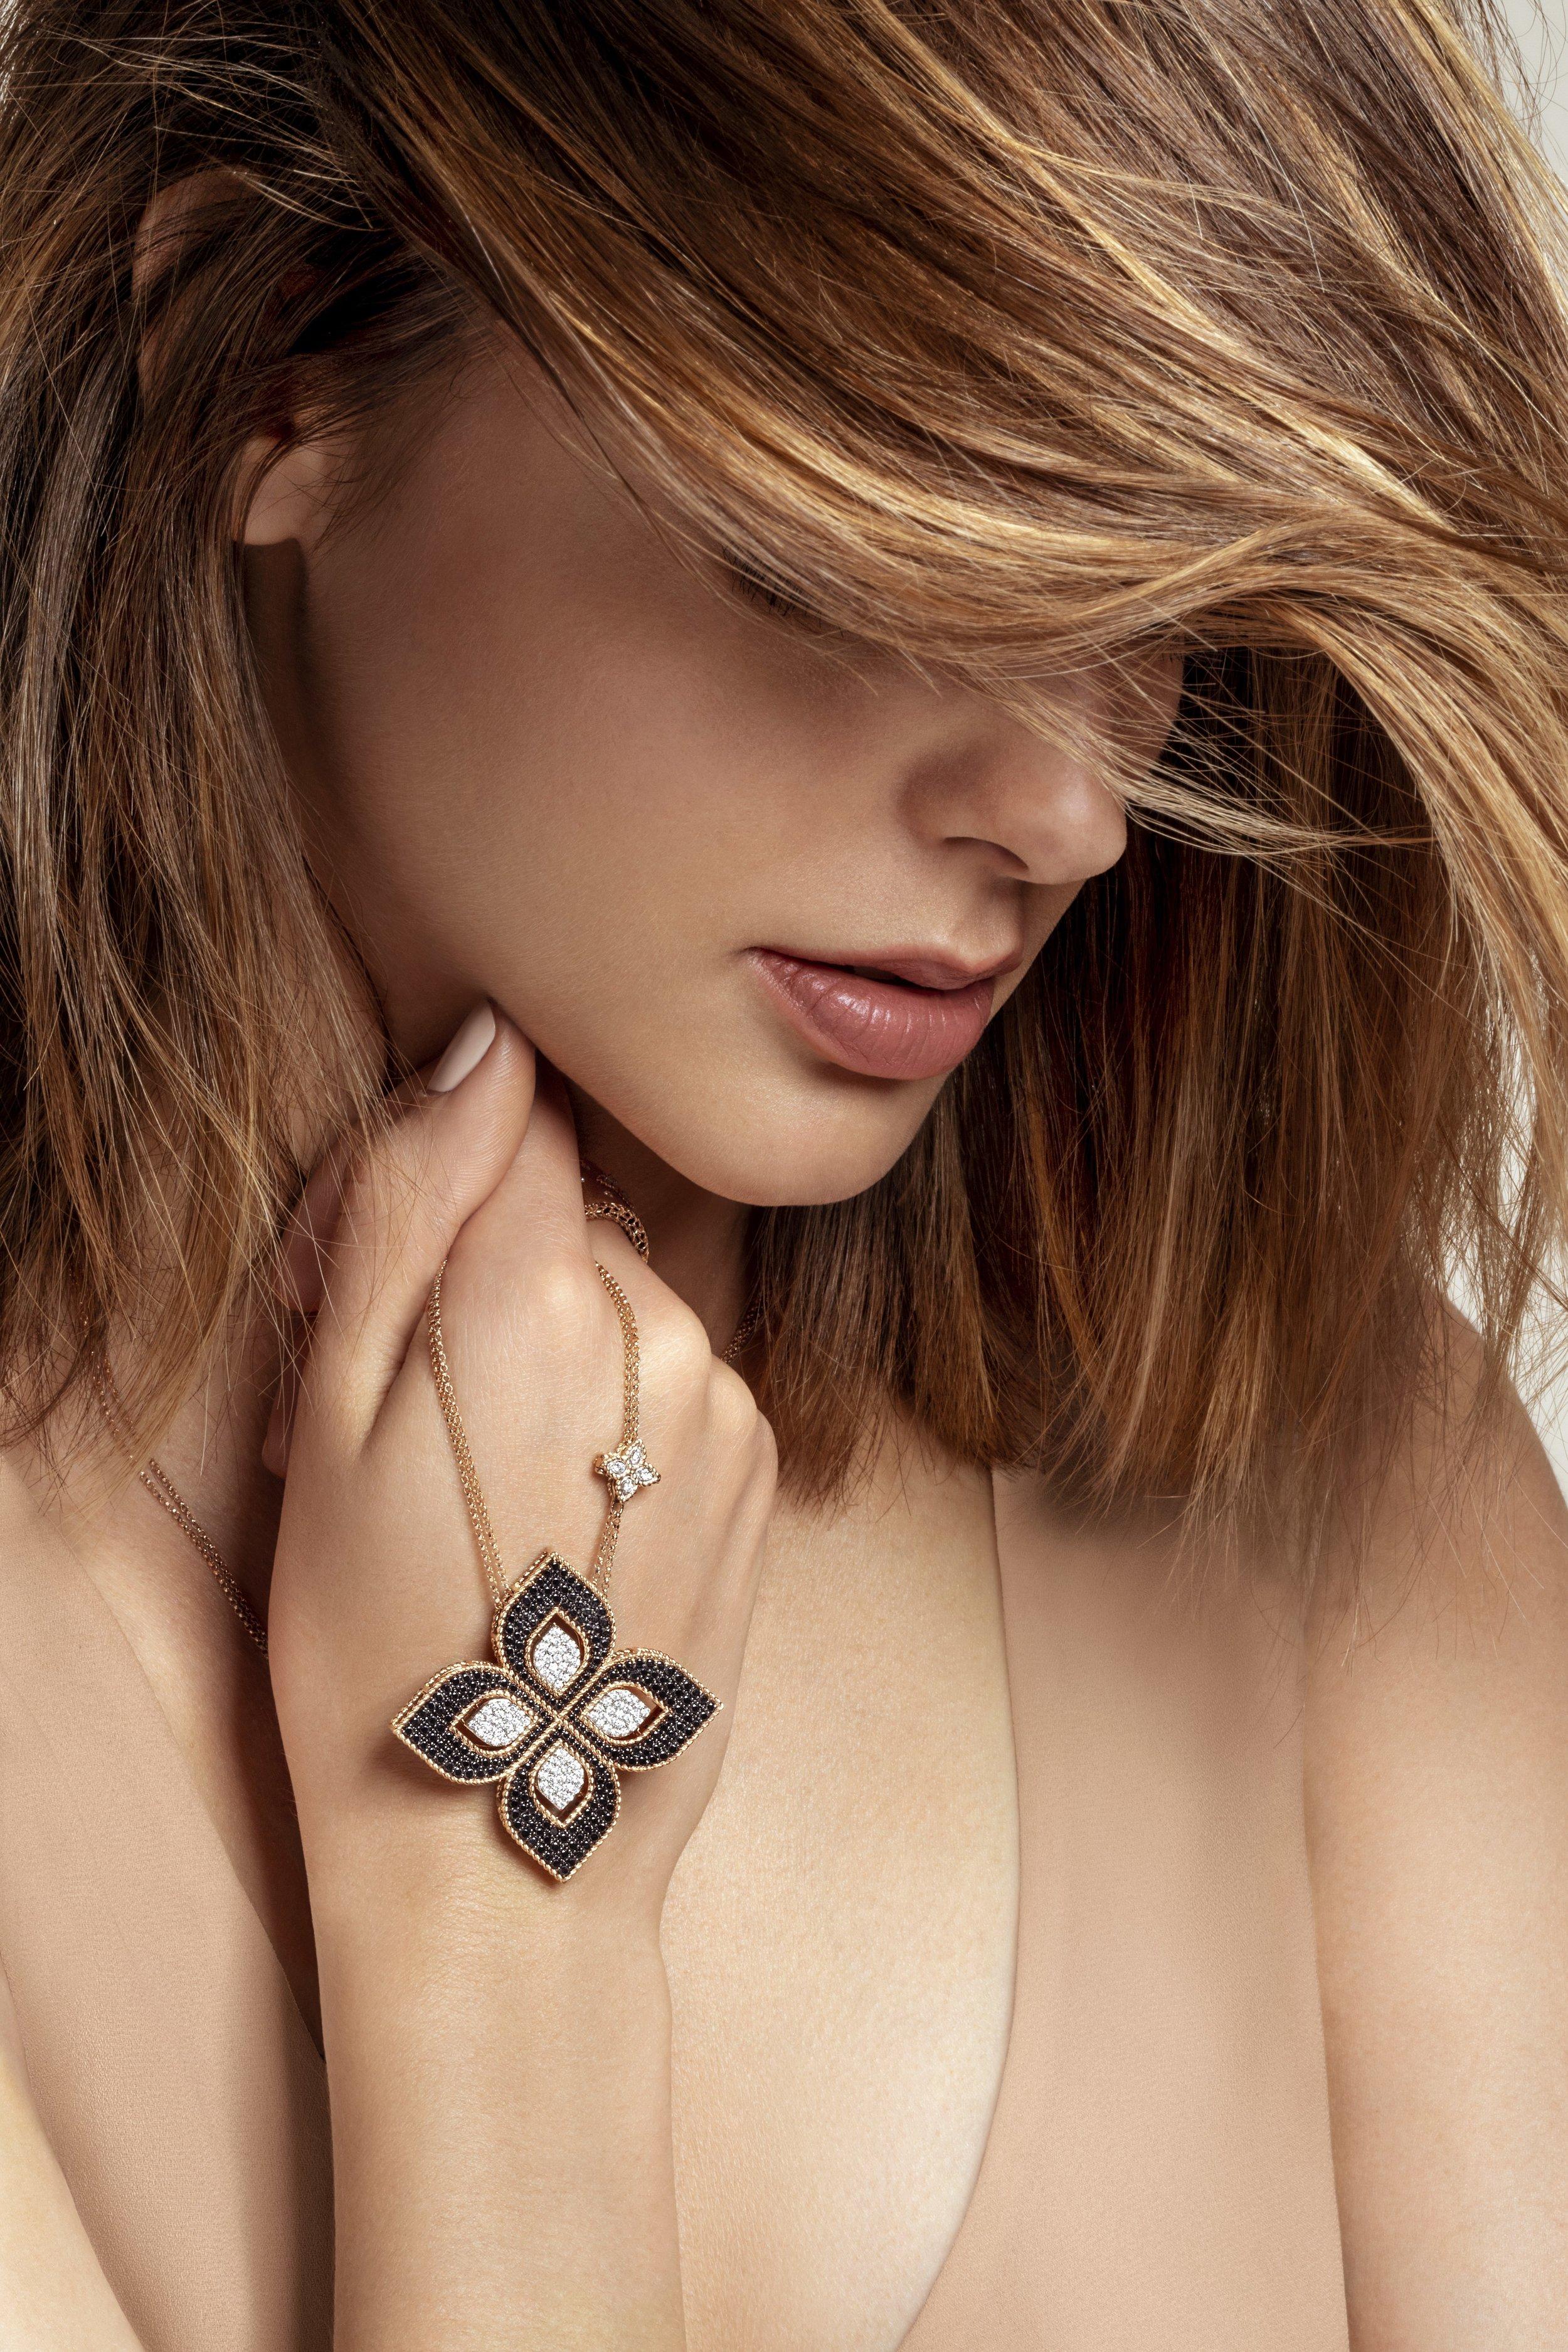 nyc_fashion_photographer_beauty_jewelry